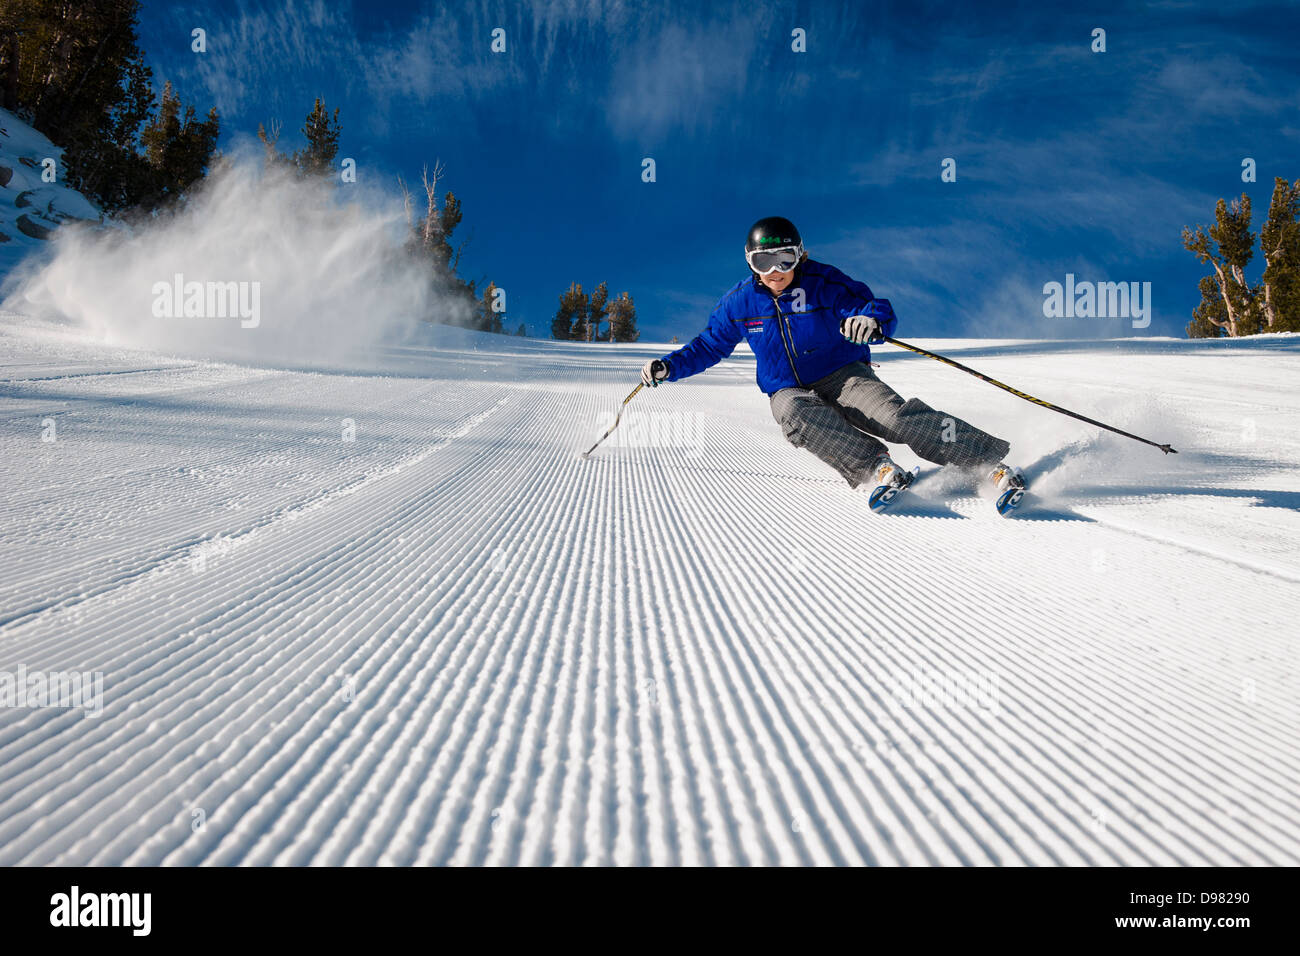 Skiing on the perfect groomed ski slopes at Mt. Rose Ski Tahoe ski resort near Lake Tahoe. Stock Photo